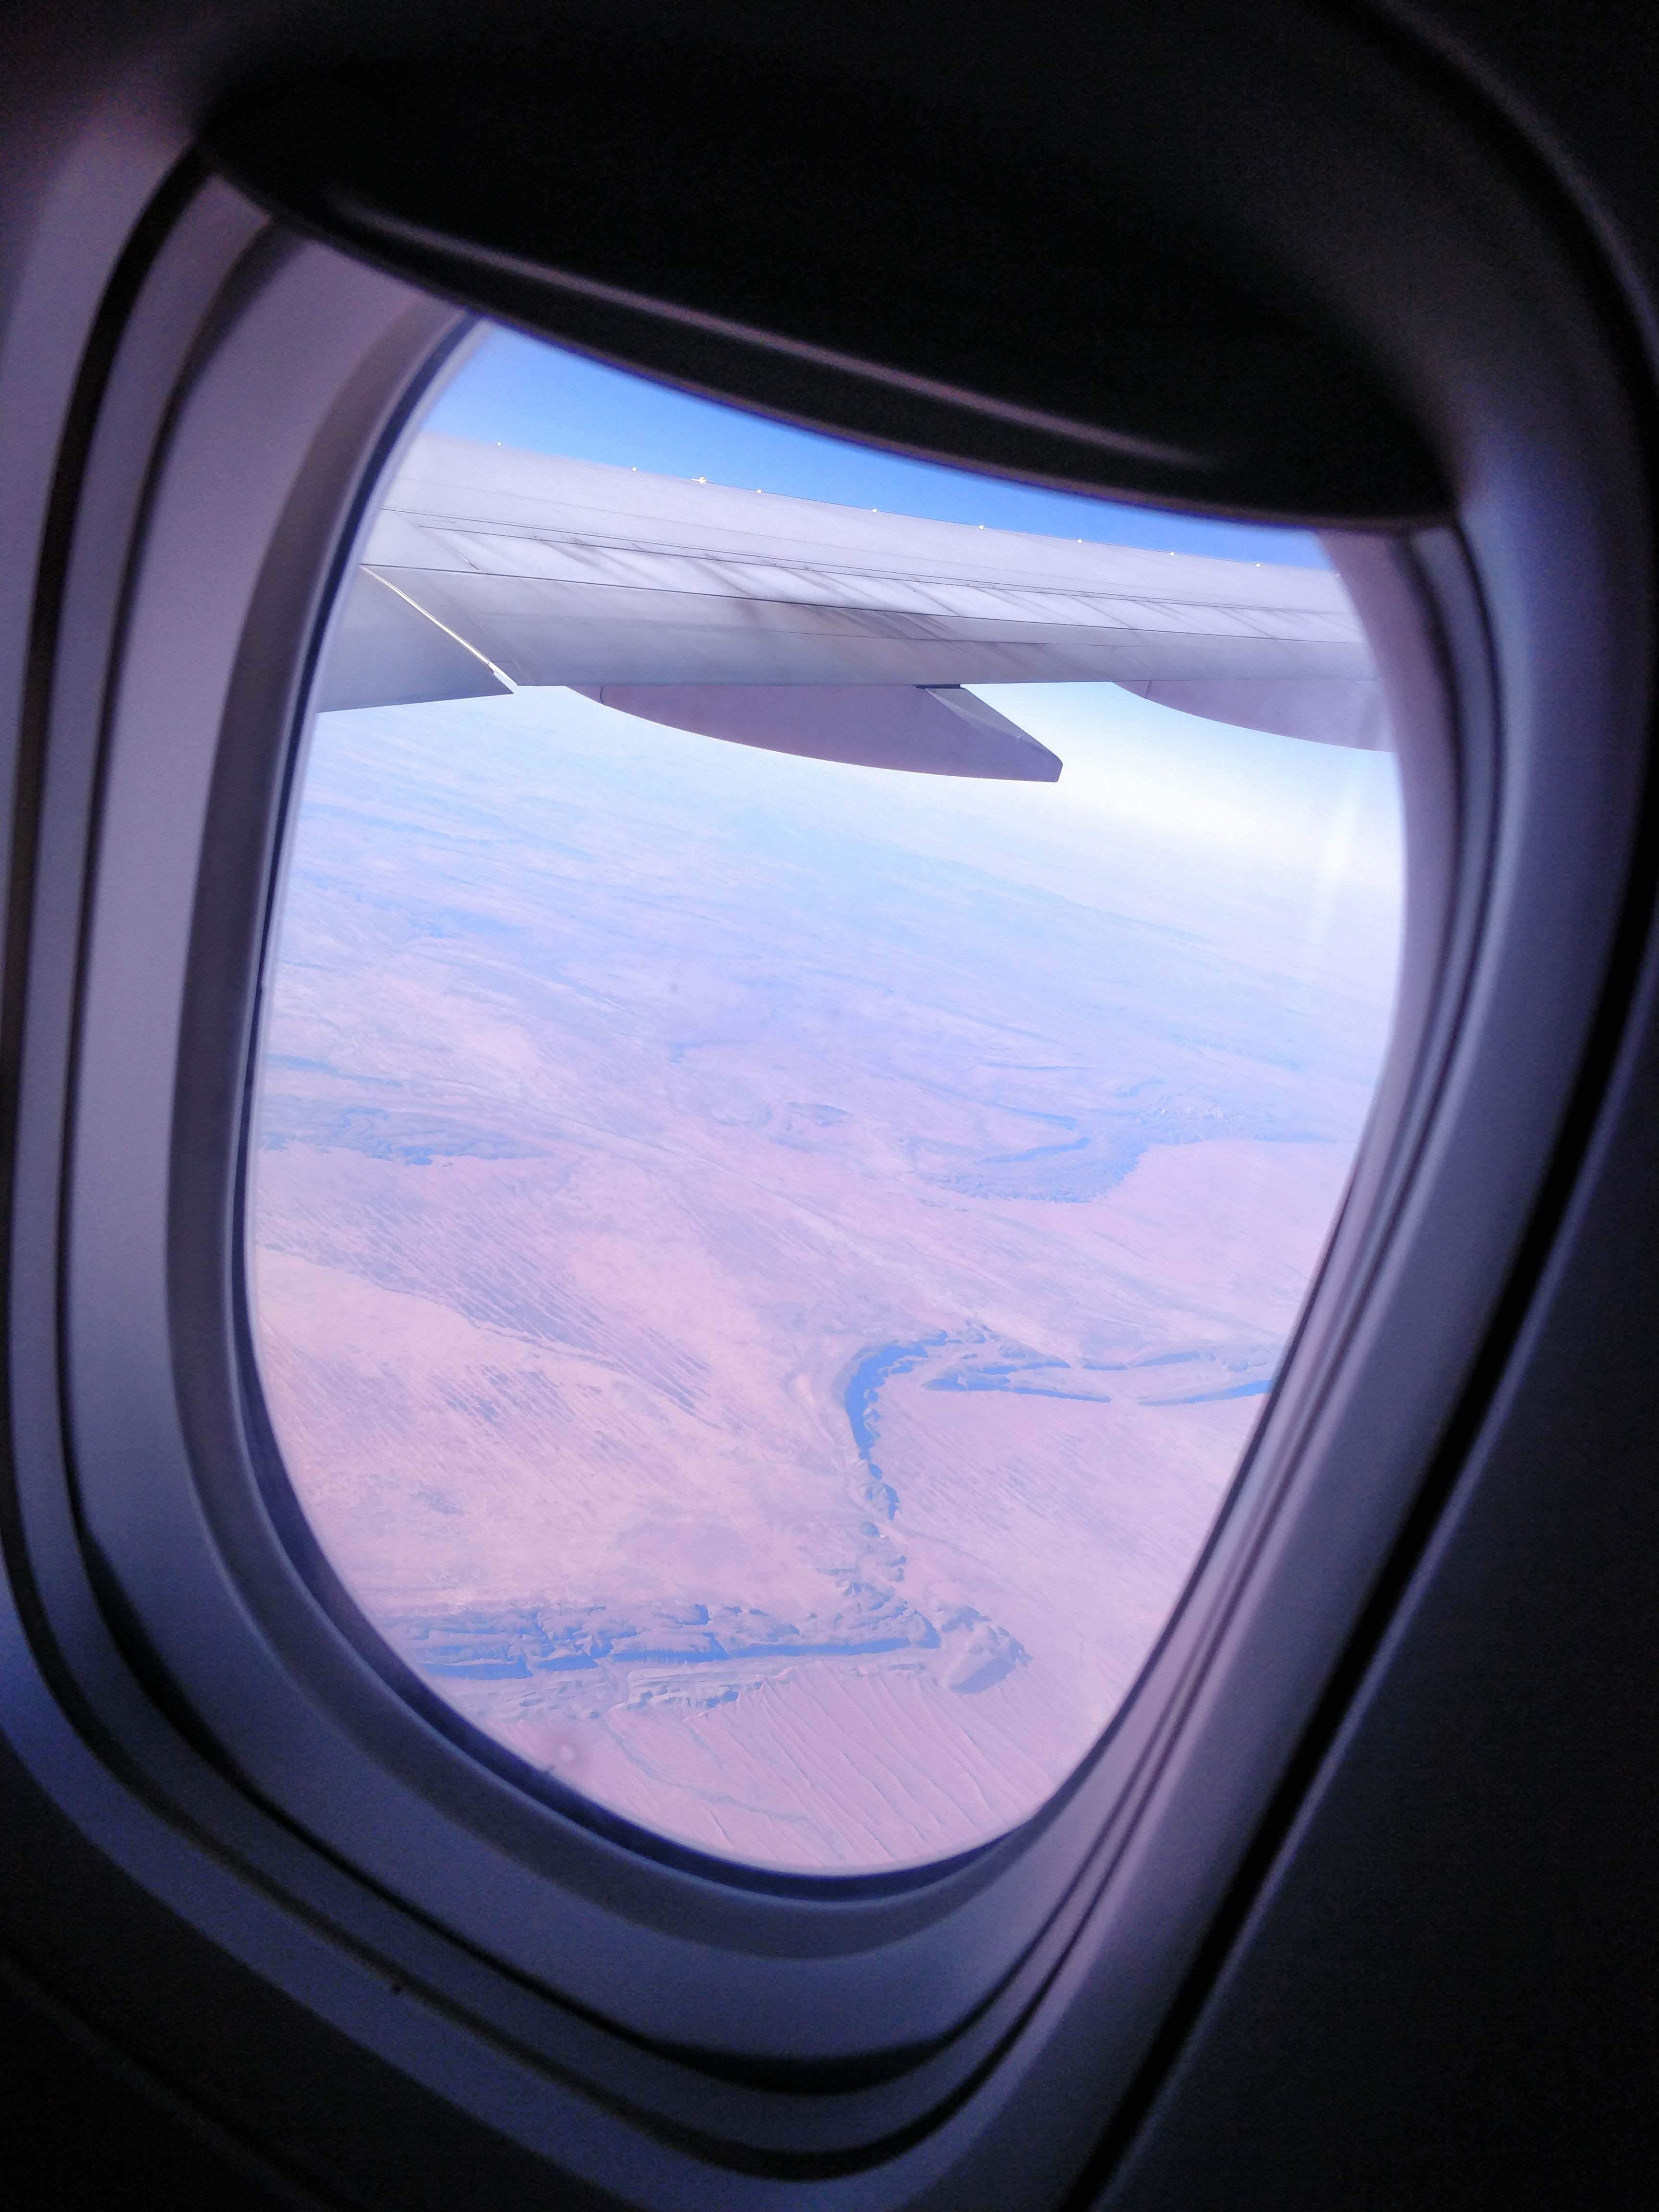 The desert, as seen through a plane window.